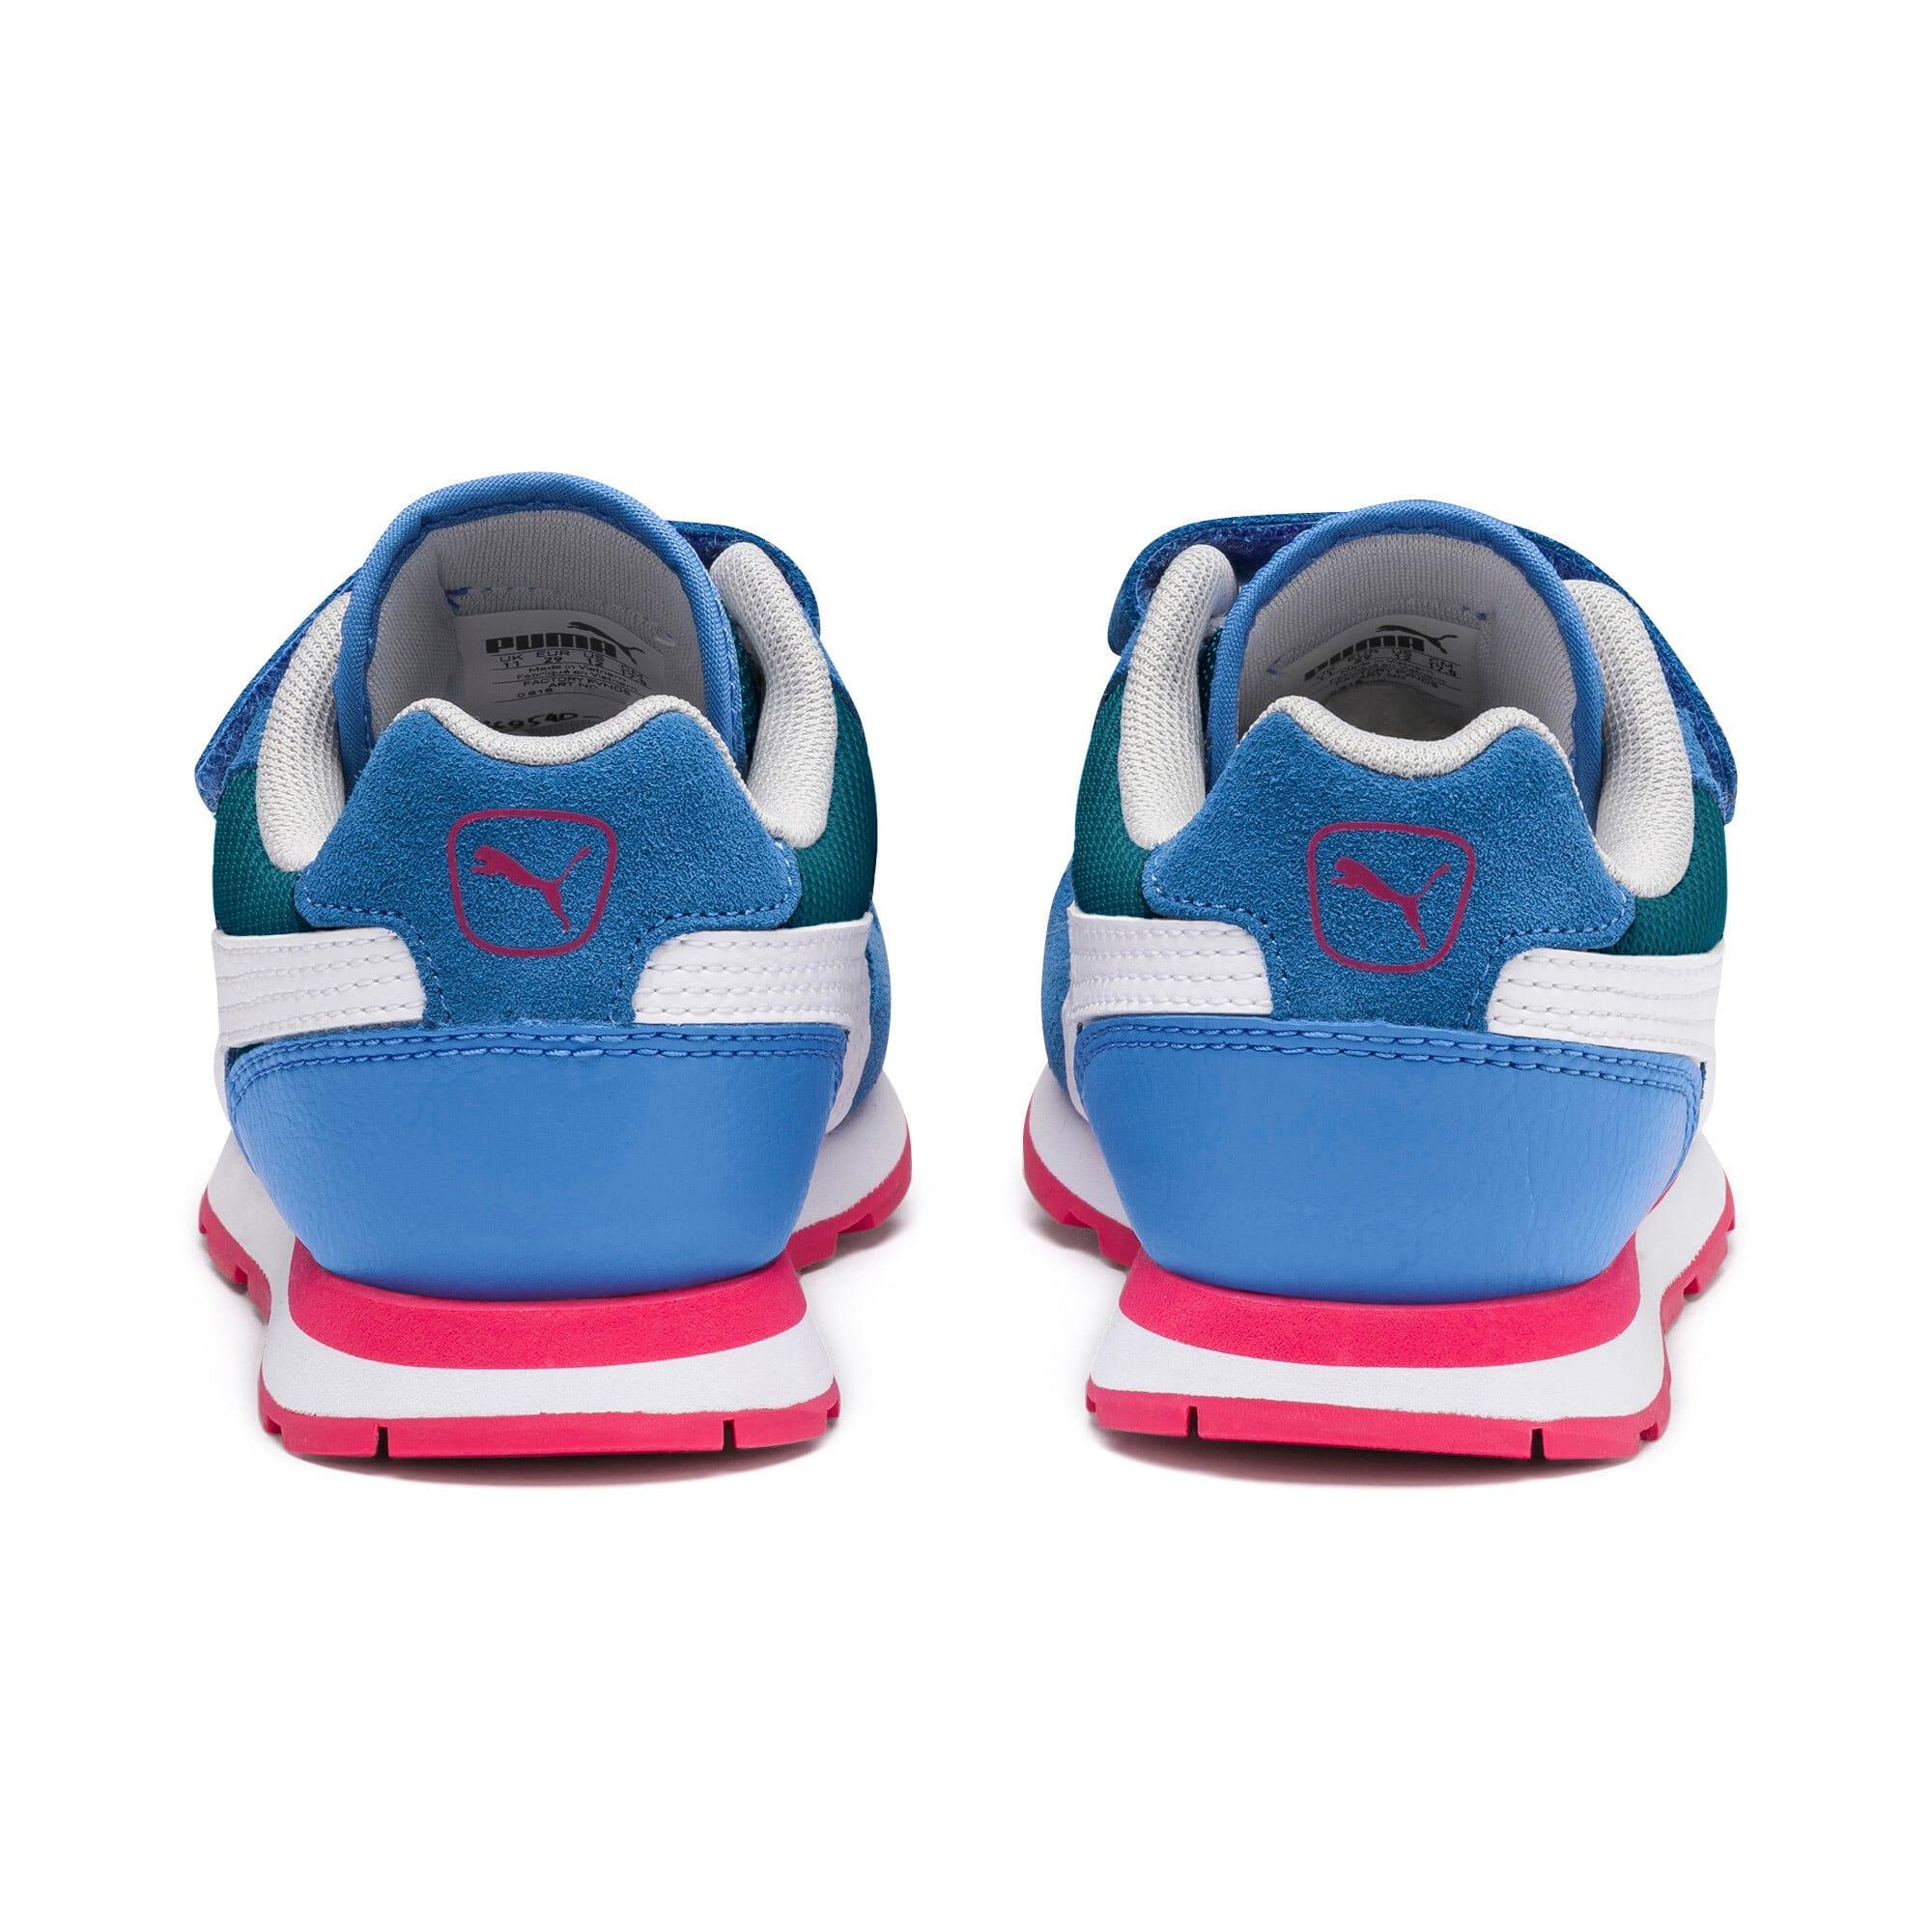 Miniatura 3 de Zapatos Vista para niños, Ultramarine-Puma White, mediano